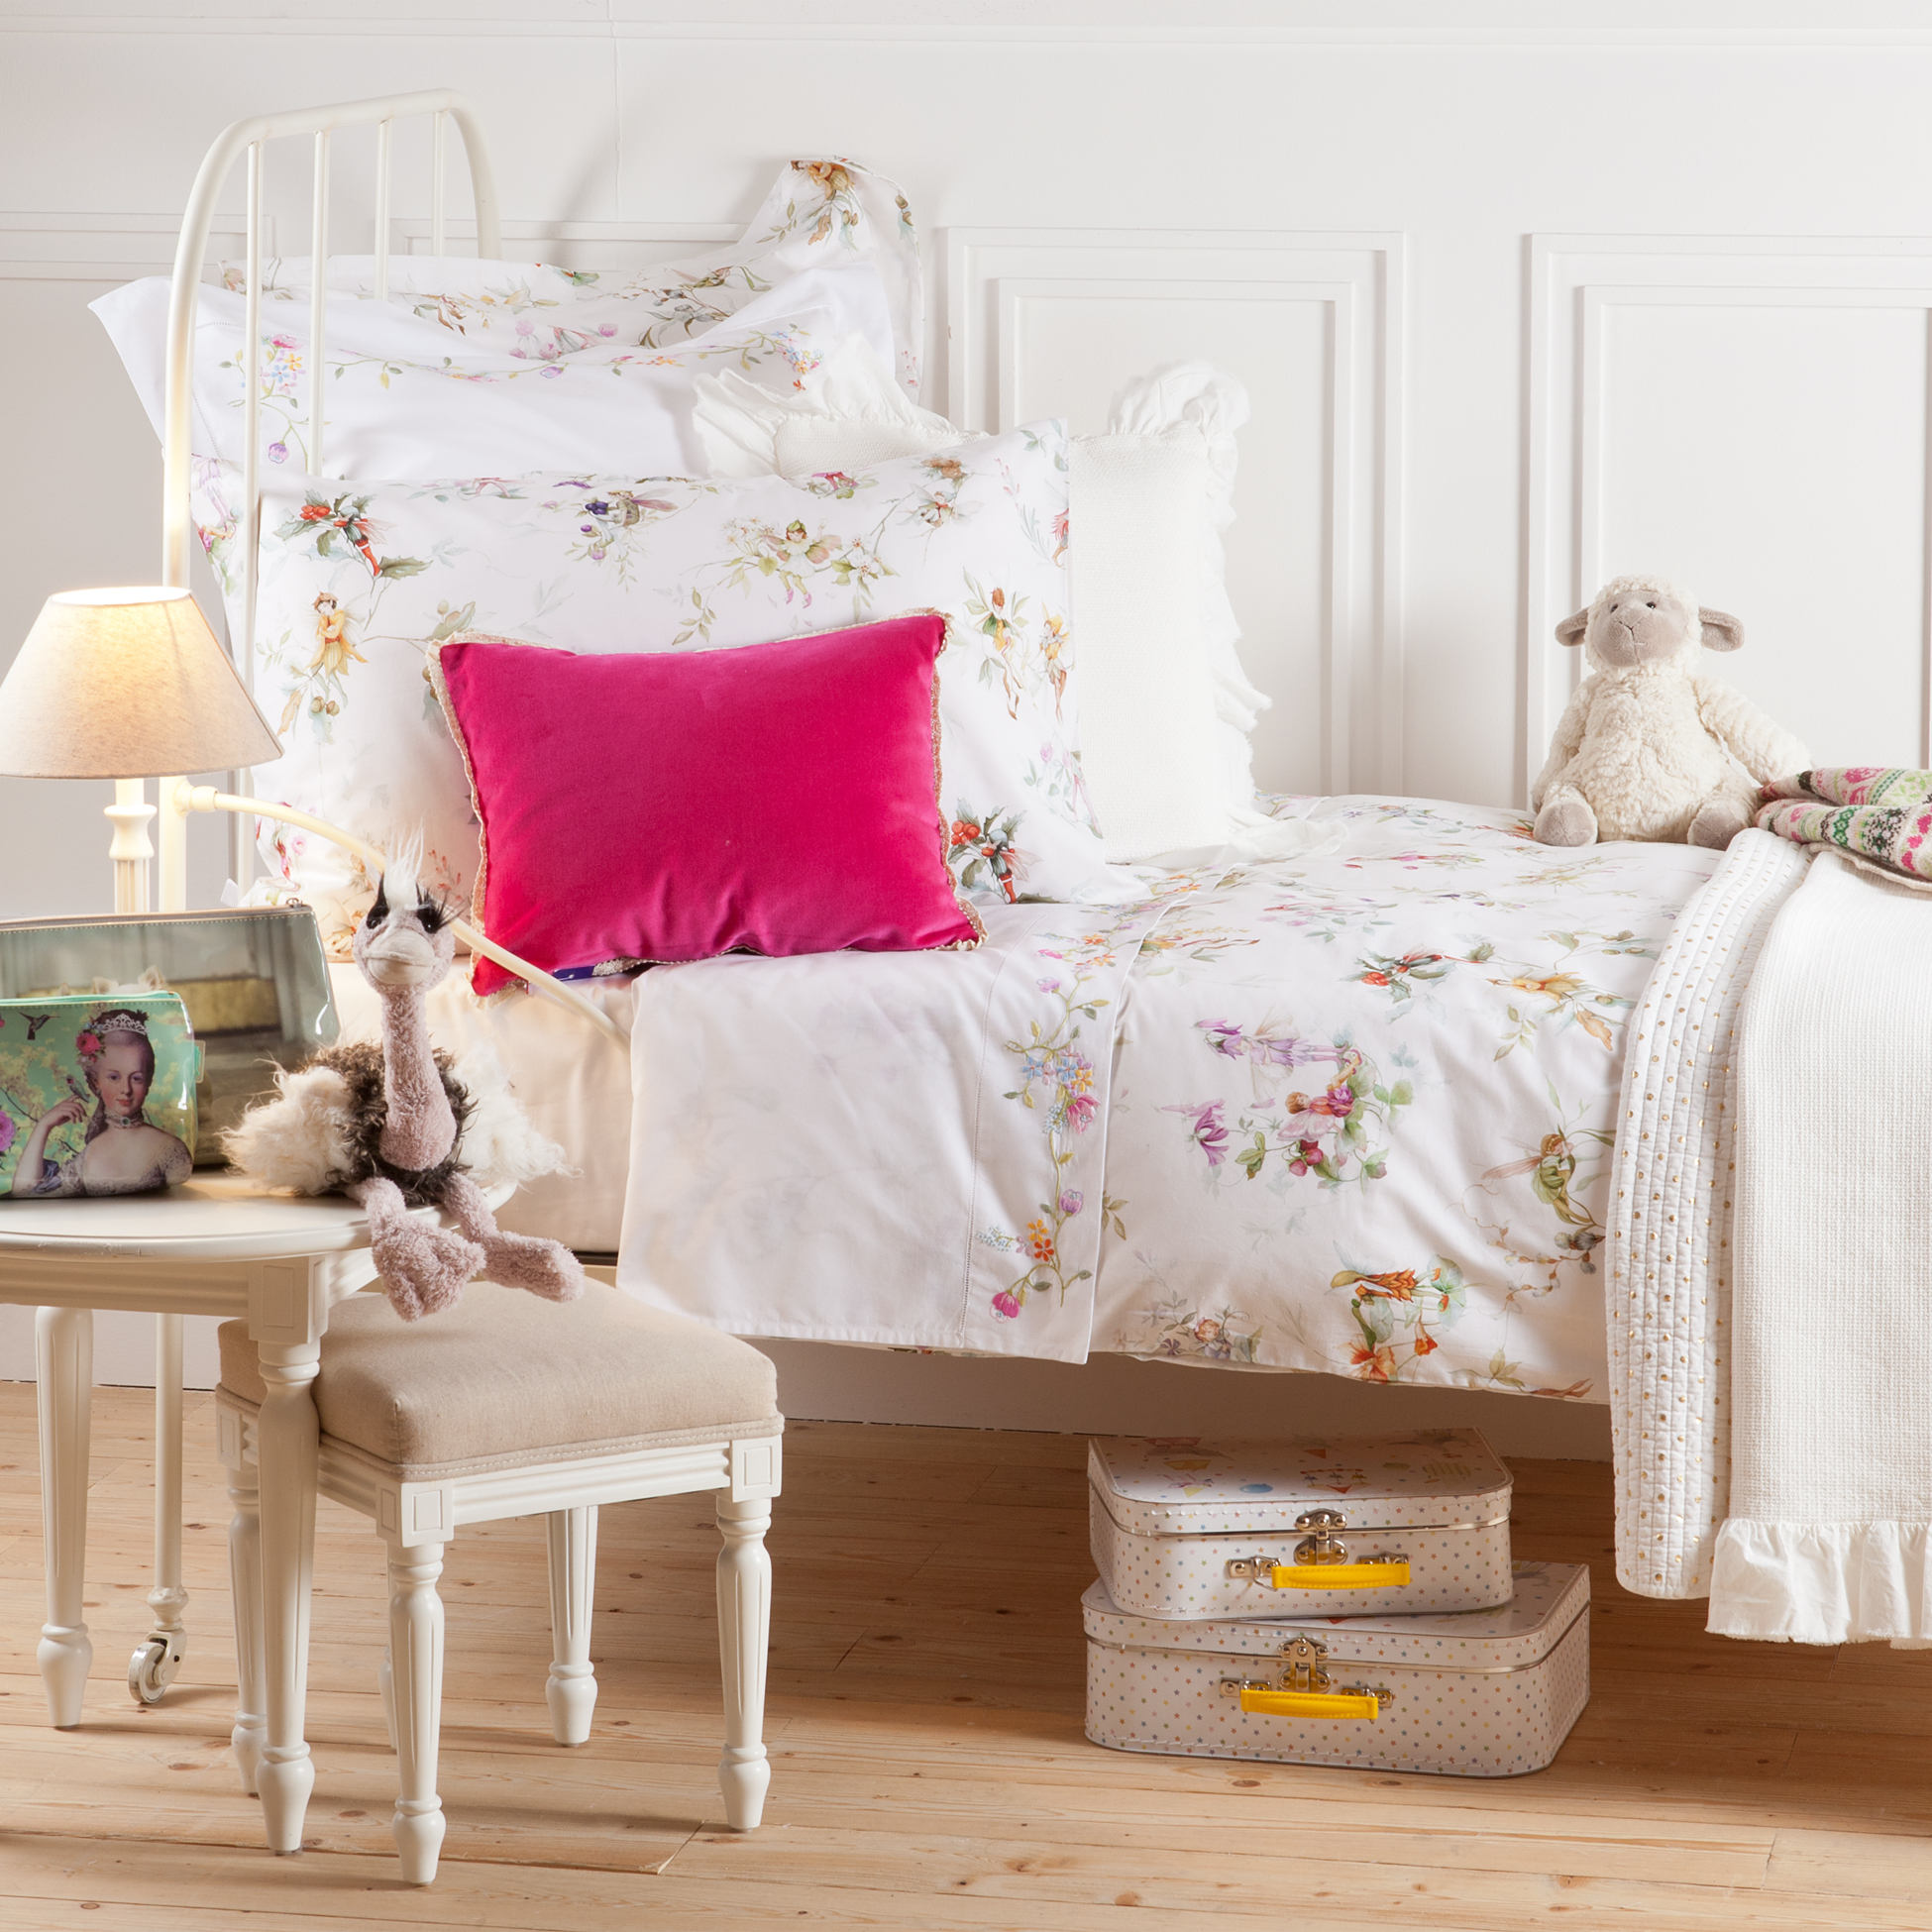 Zara espagne en ligne - Zara home kids madrid ...